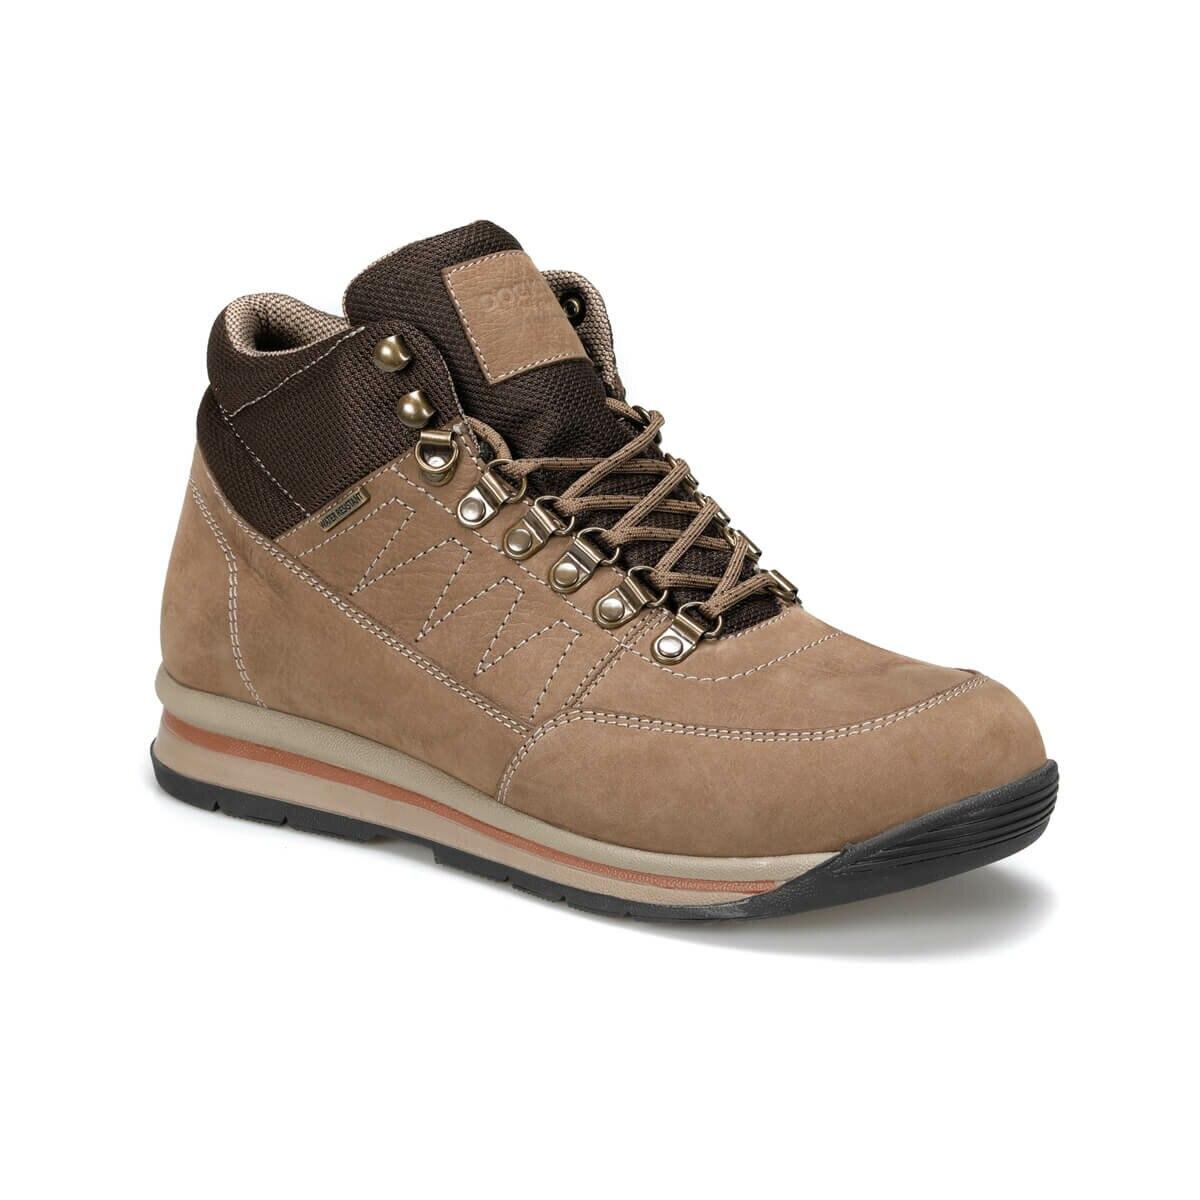 FLO 227184 9PR Sand Color Men Boots By Dockers The Gerle